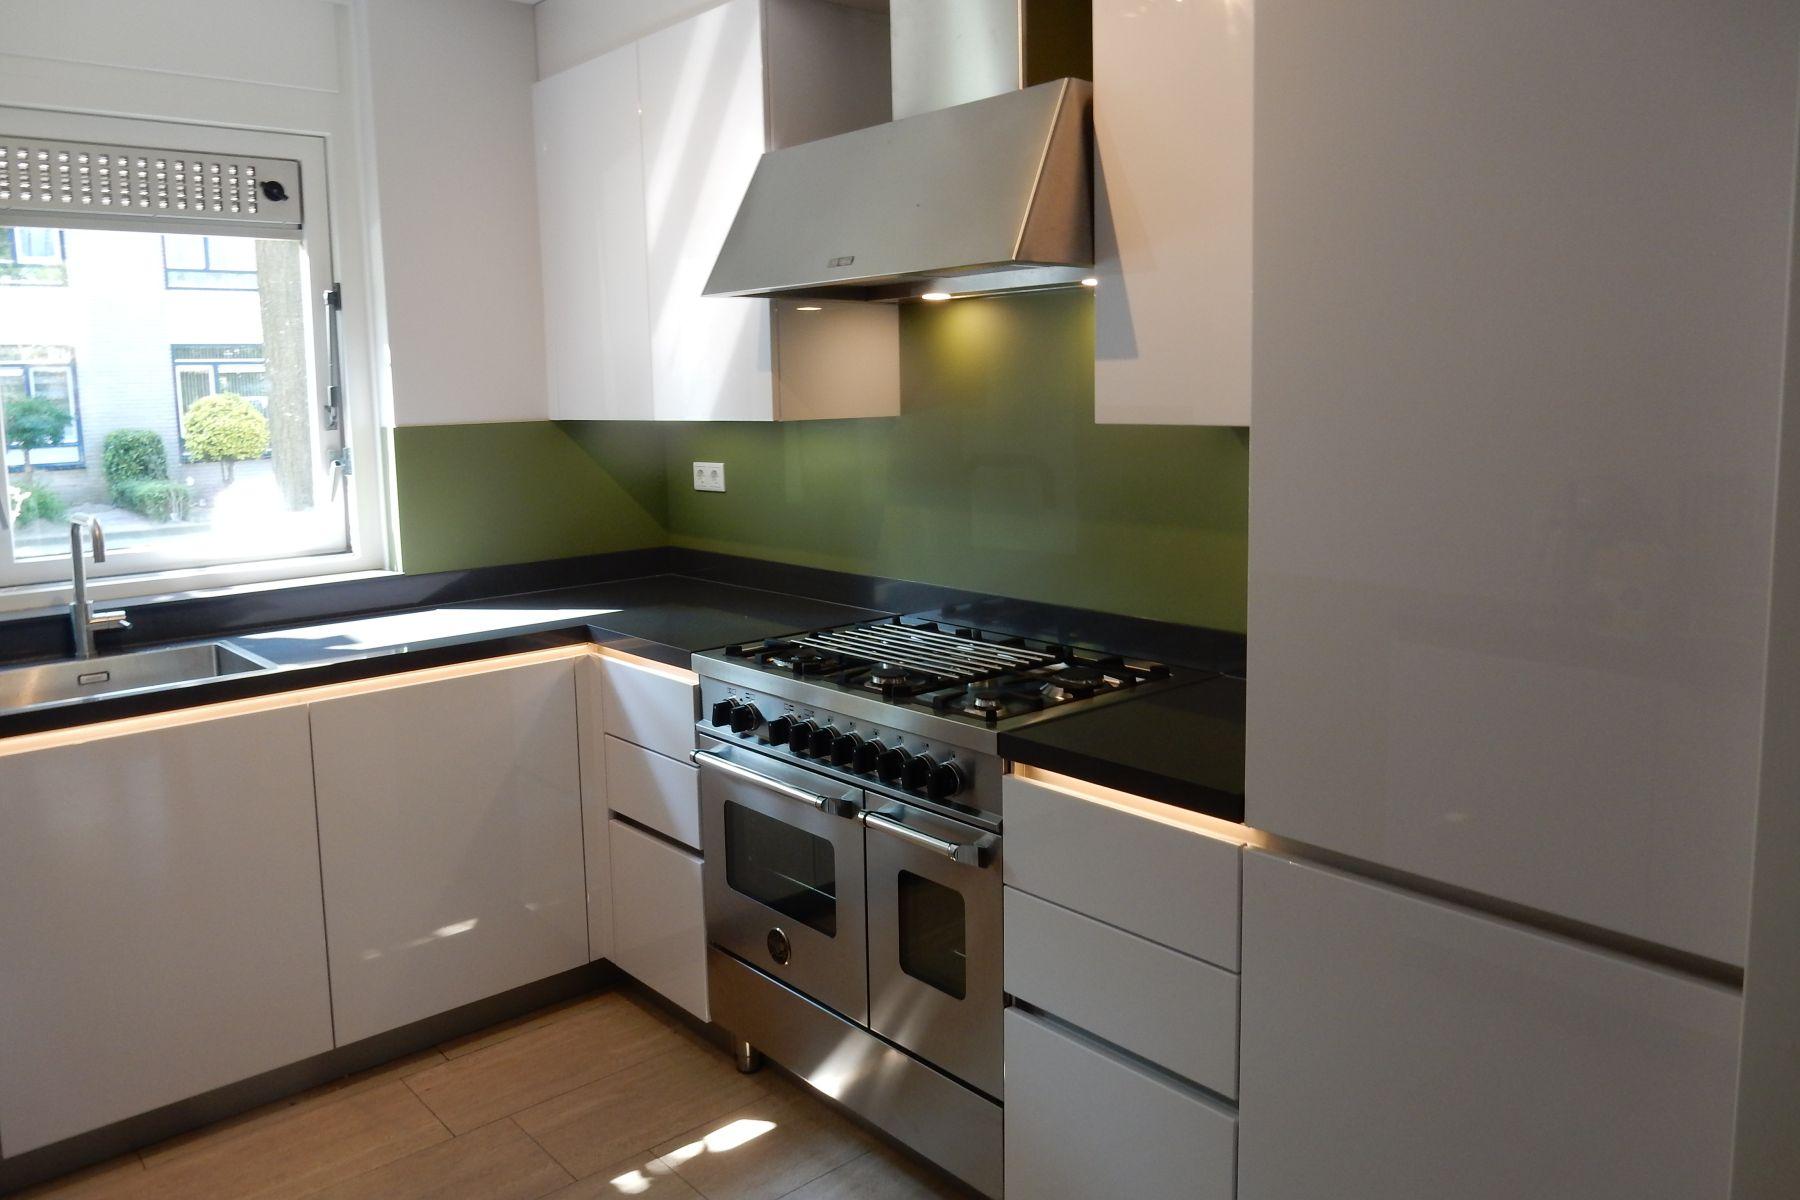 Achterwand Voor Keuken : Achterwand keuken